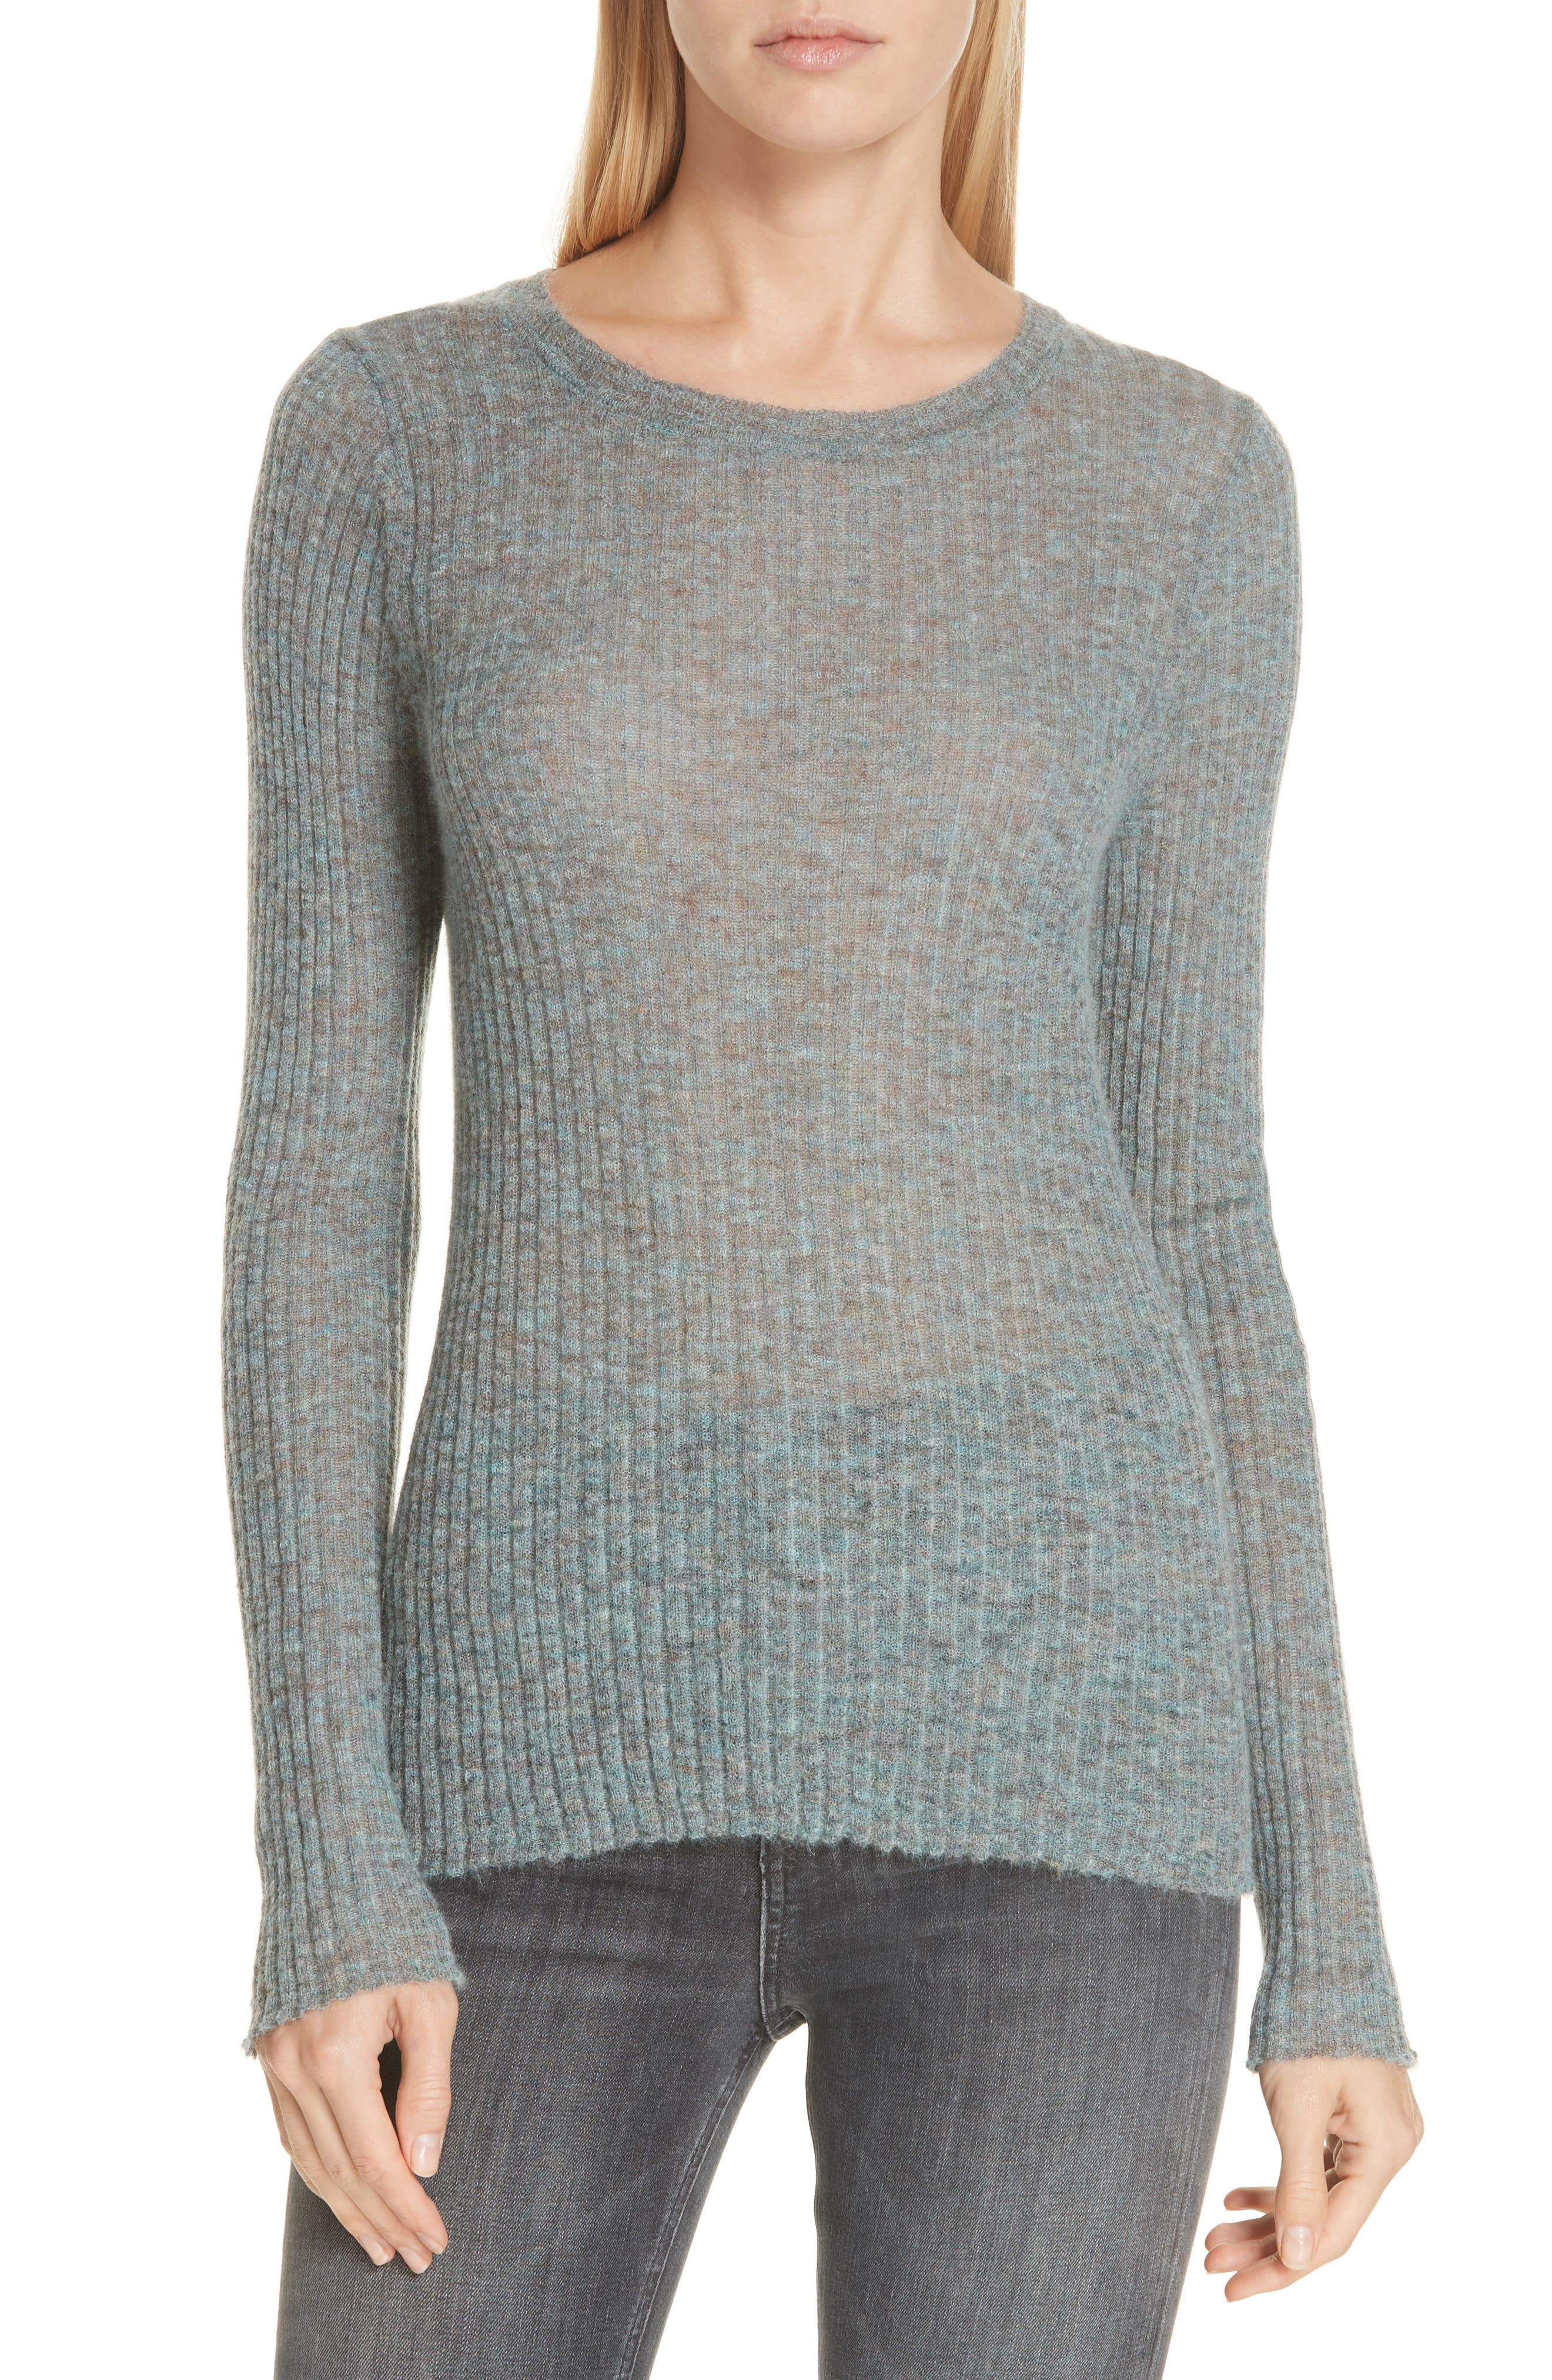 Rag & Bone Donna Mohair & Wool Blend Sweater, Blue